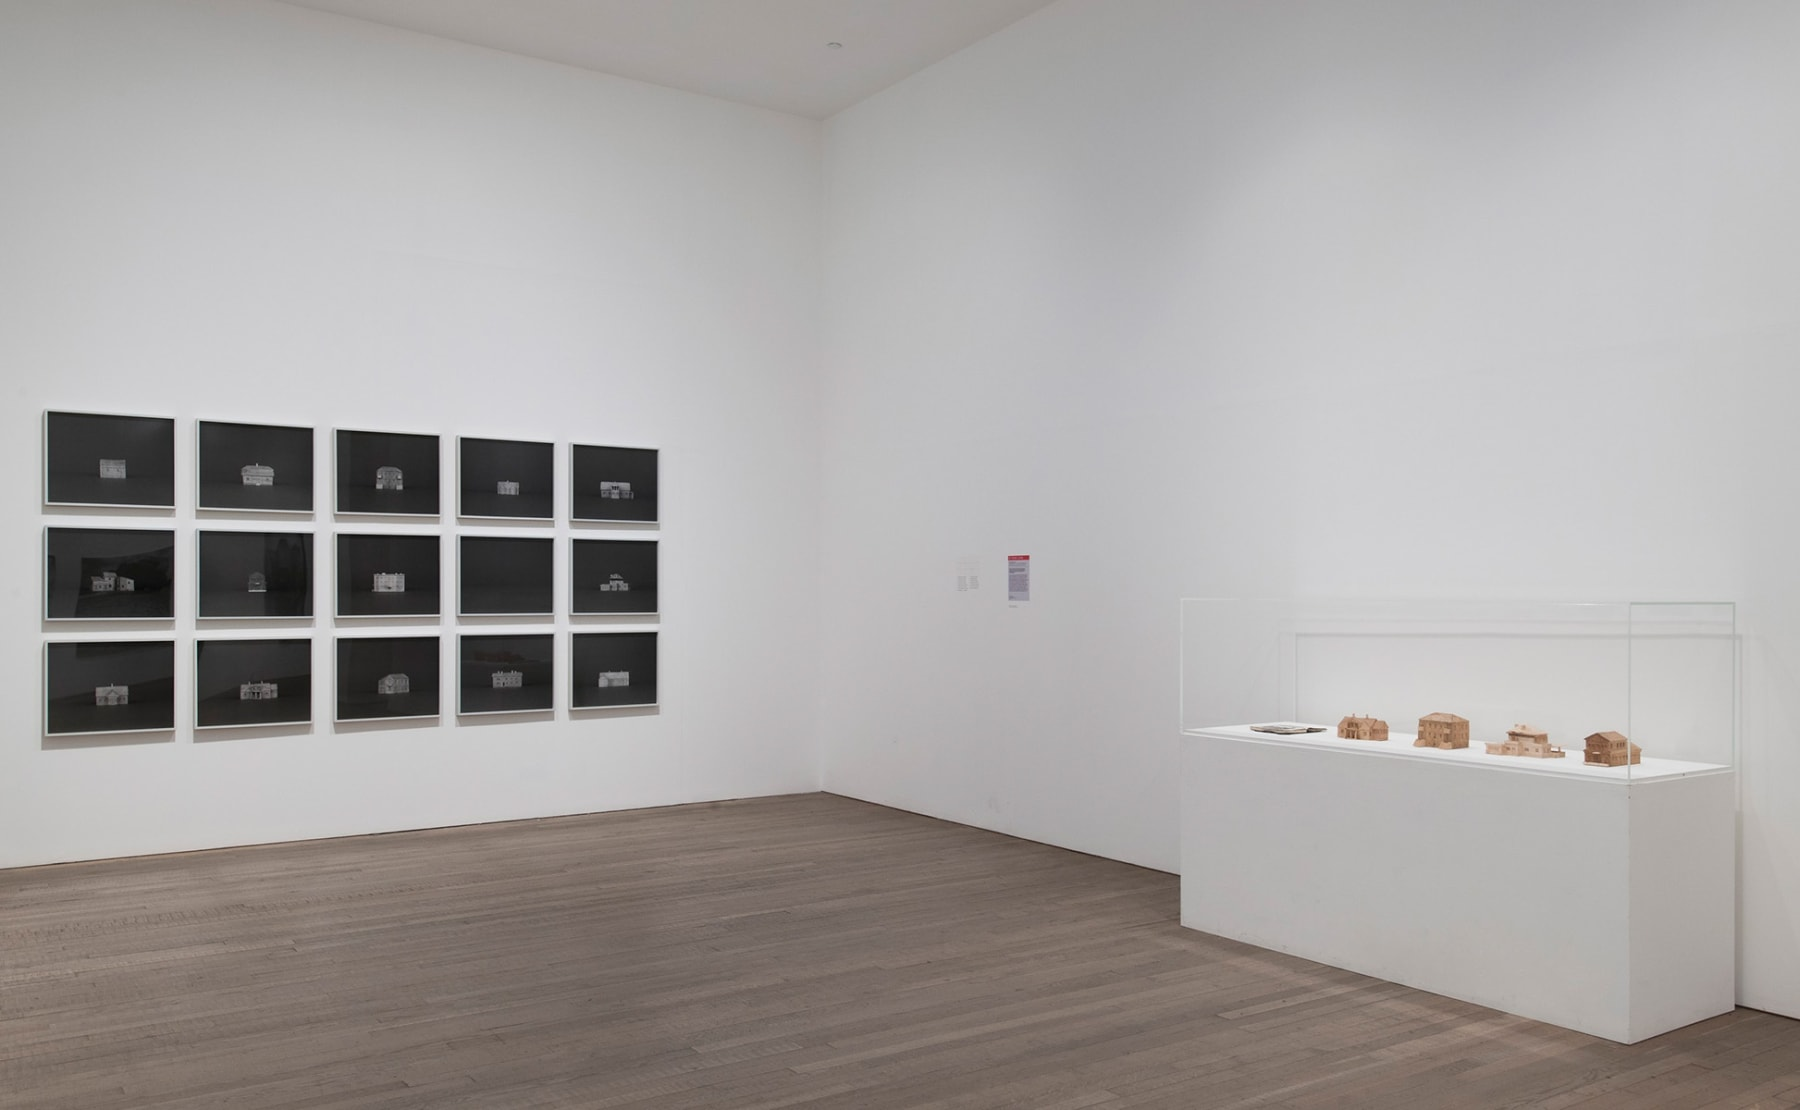 Tate Modern, 2014 Installation shot from exhibiton